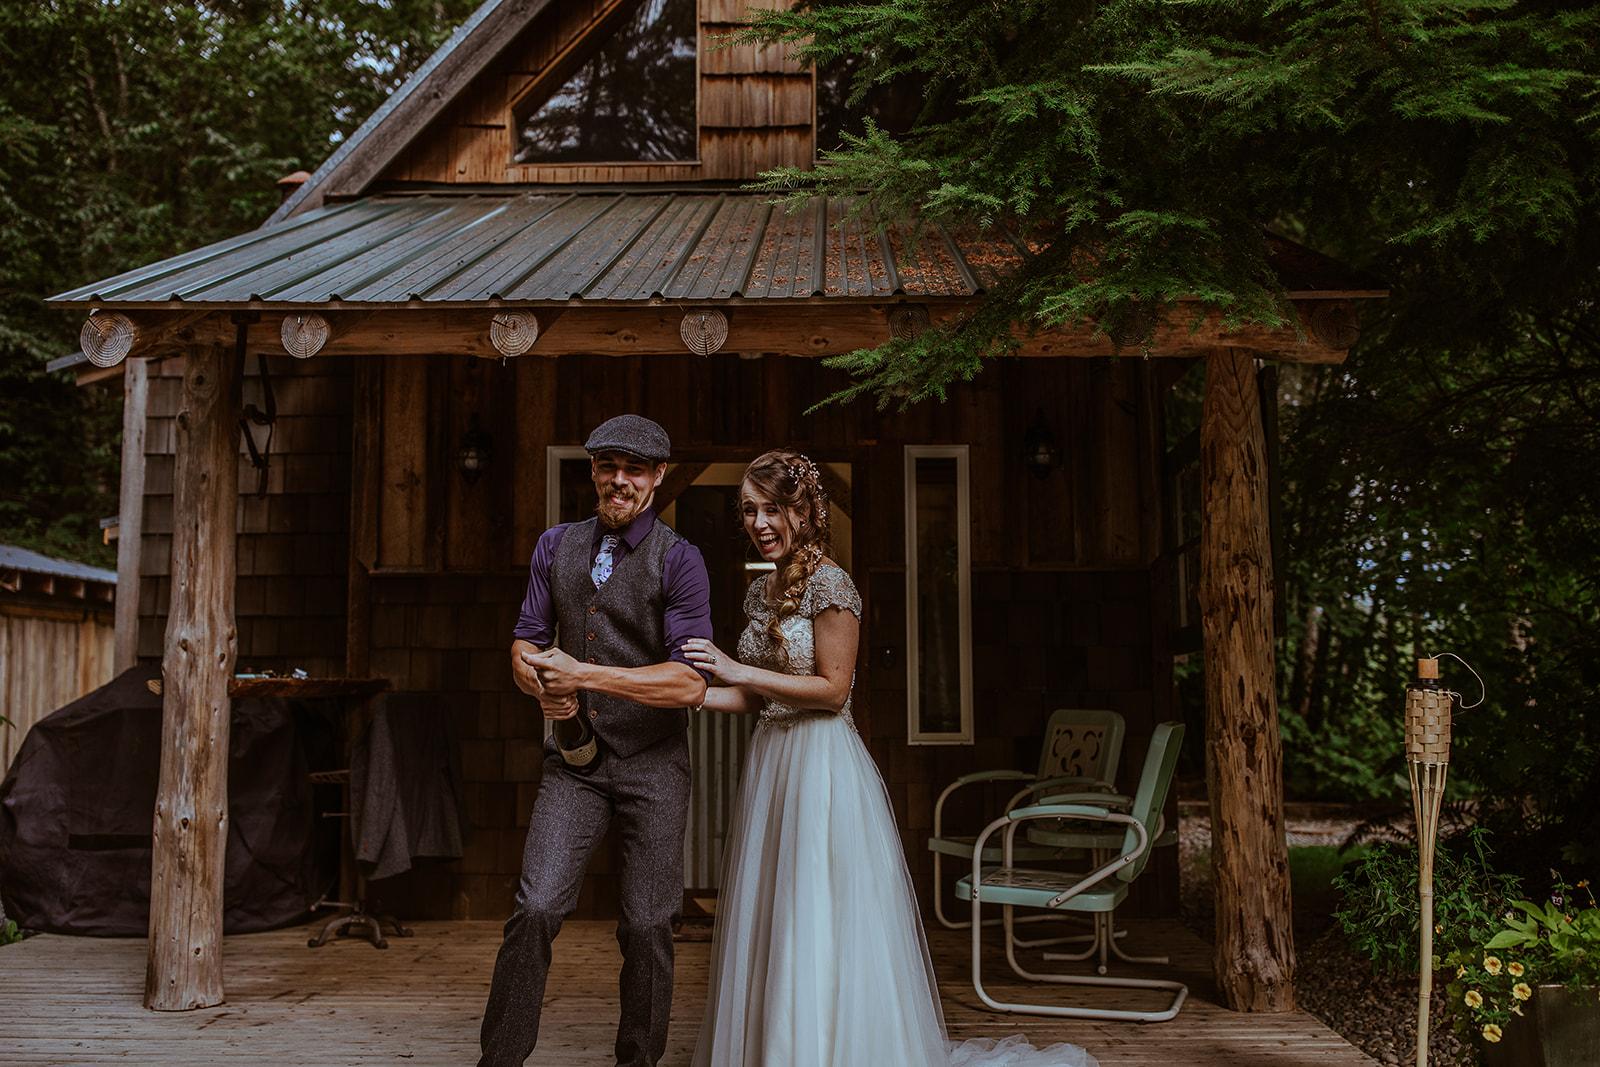 mount-rainier-cabin-elopement-megan-gallagher-photography_(313_of_568).jpg